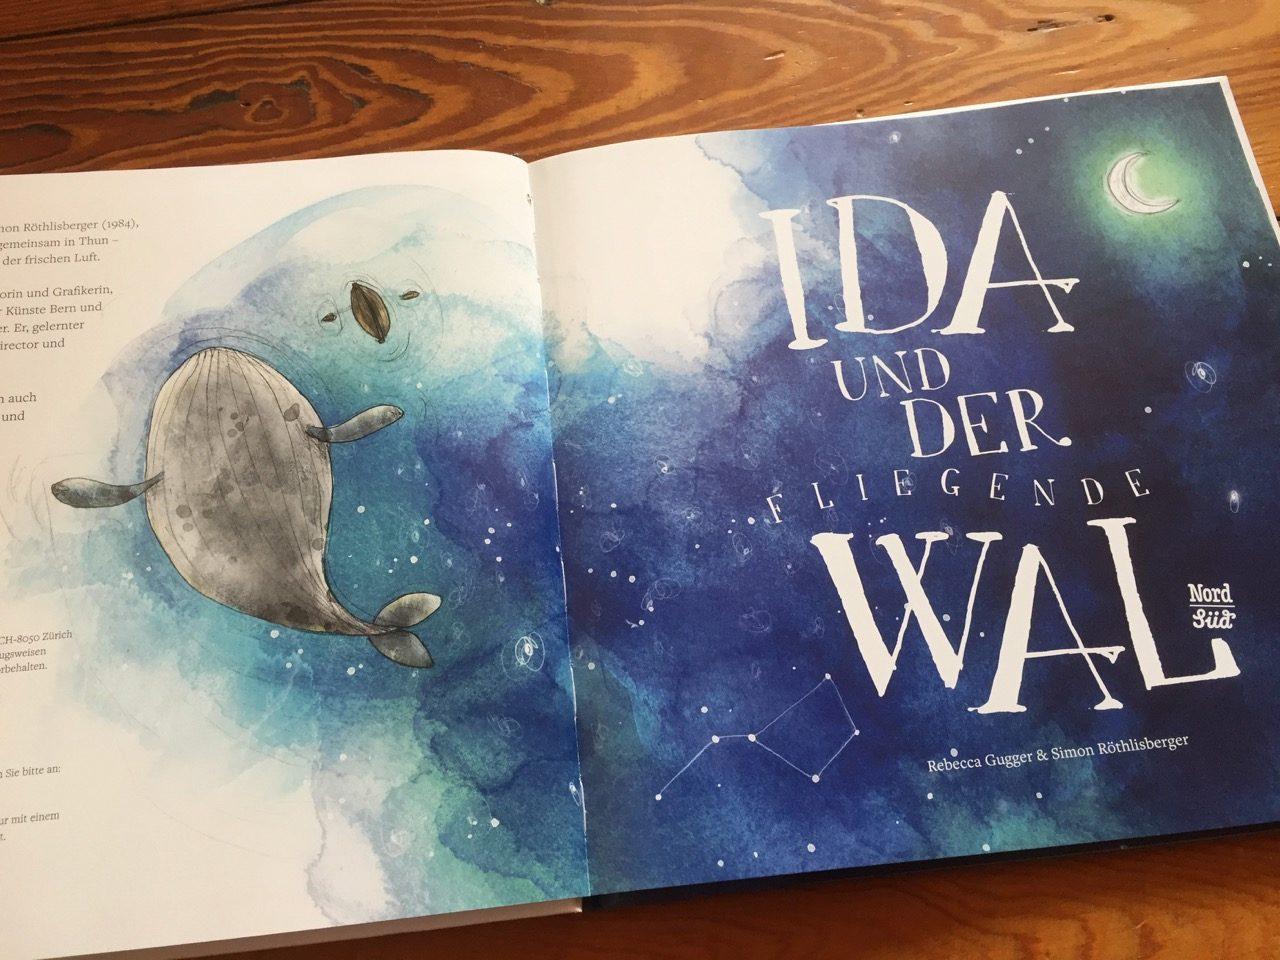 Ida und der fliegende Wal Gugger Röthlisberger NordSued Verlag MamaDenkt 01